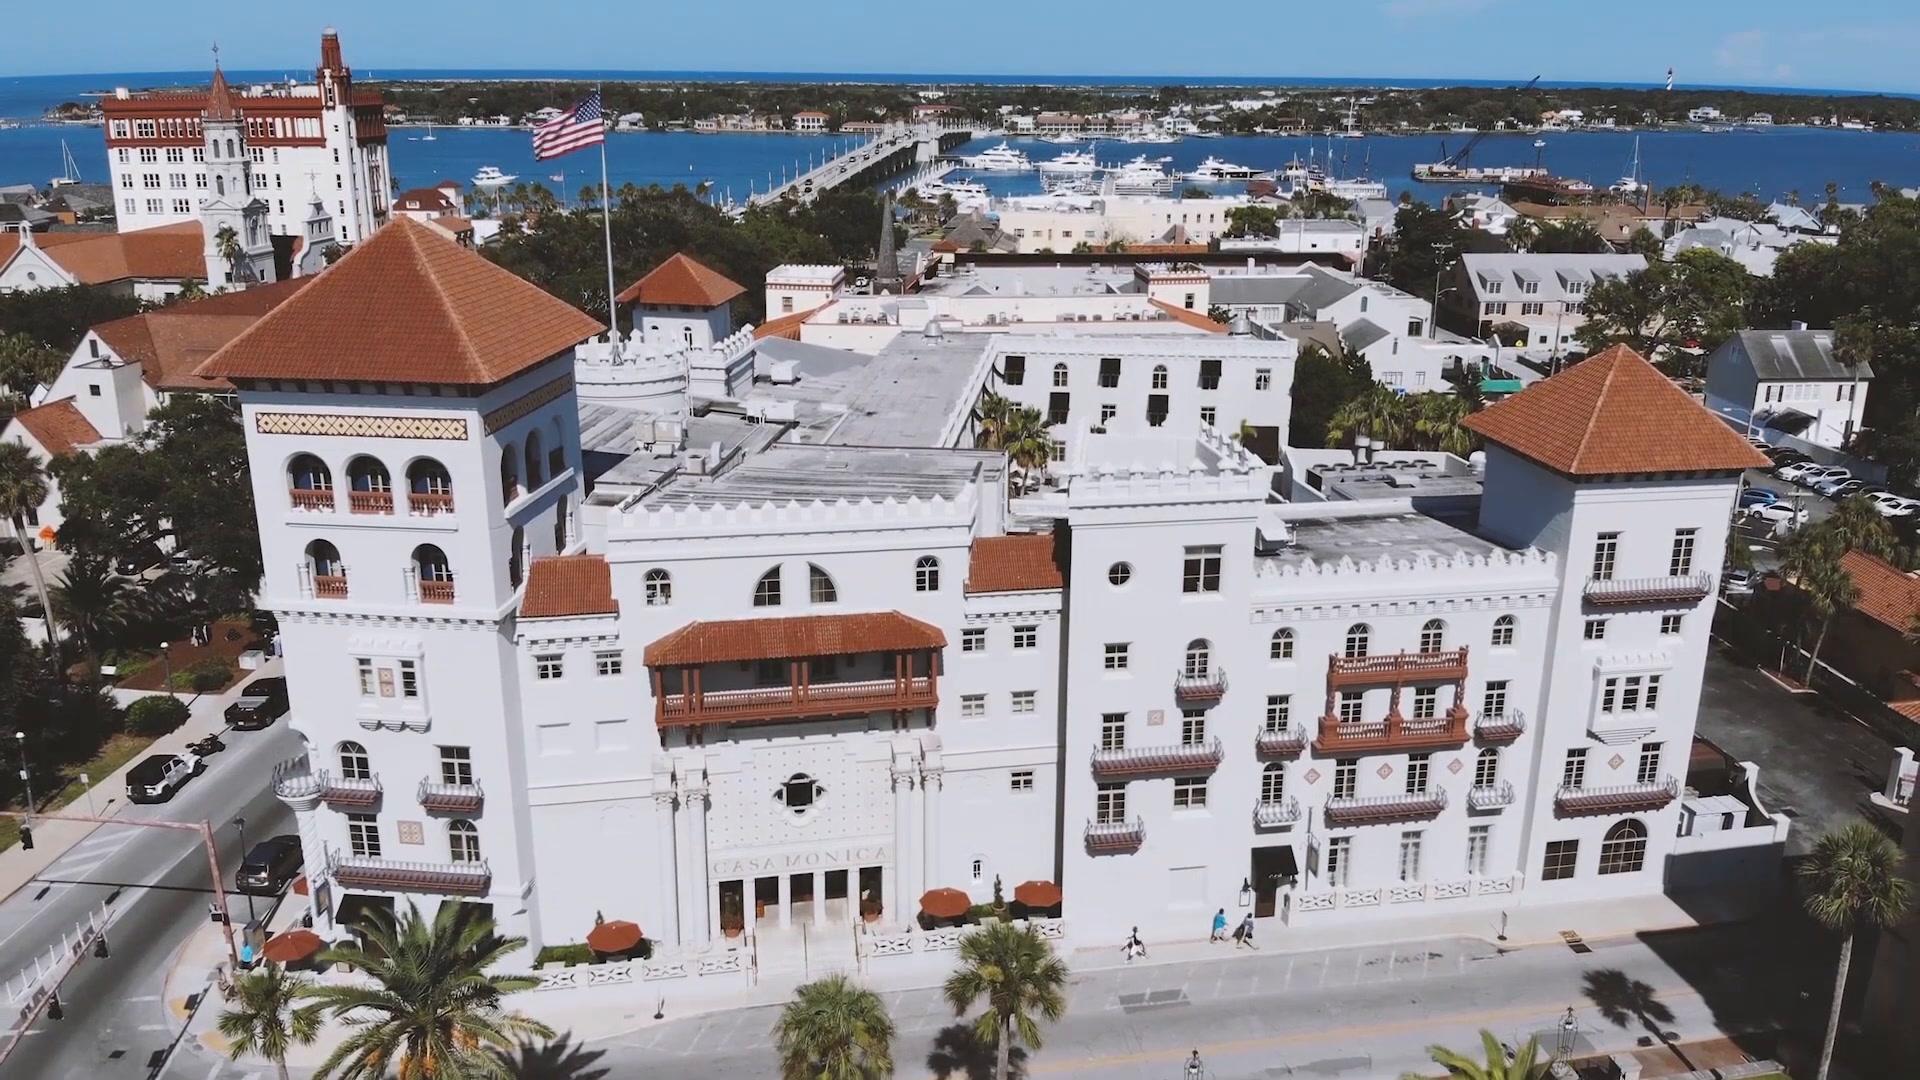 Tom  + Alia | St. Augustine, Florida | Schooner Freedom Charters